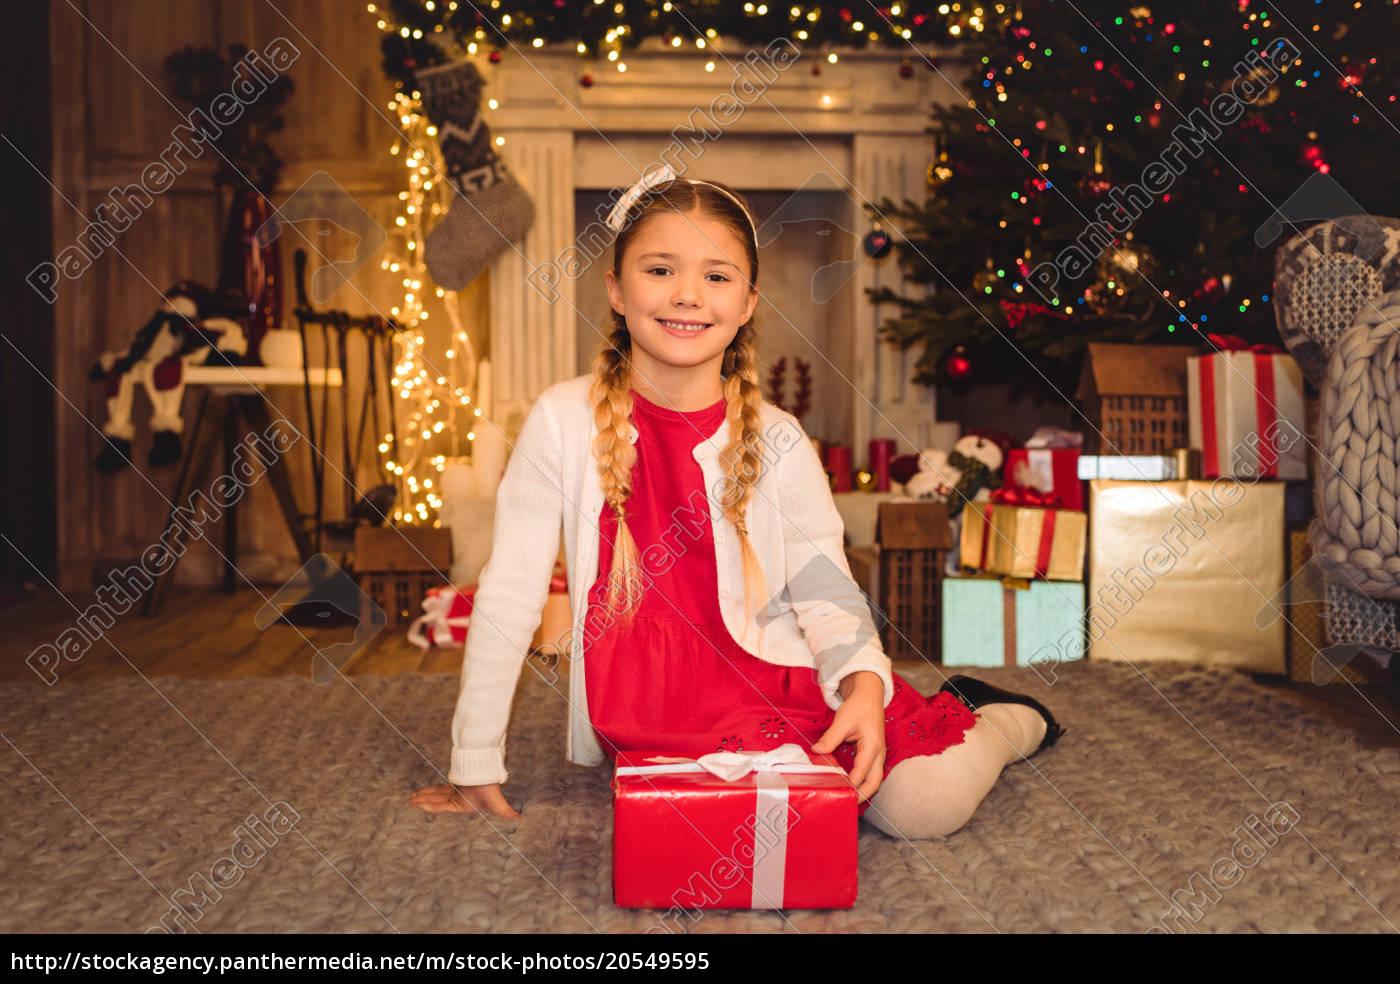 girl, holding, christmas, present - 20549595